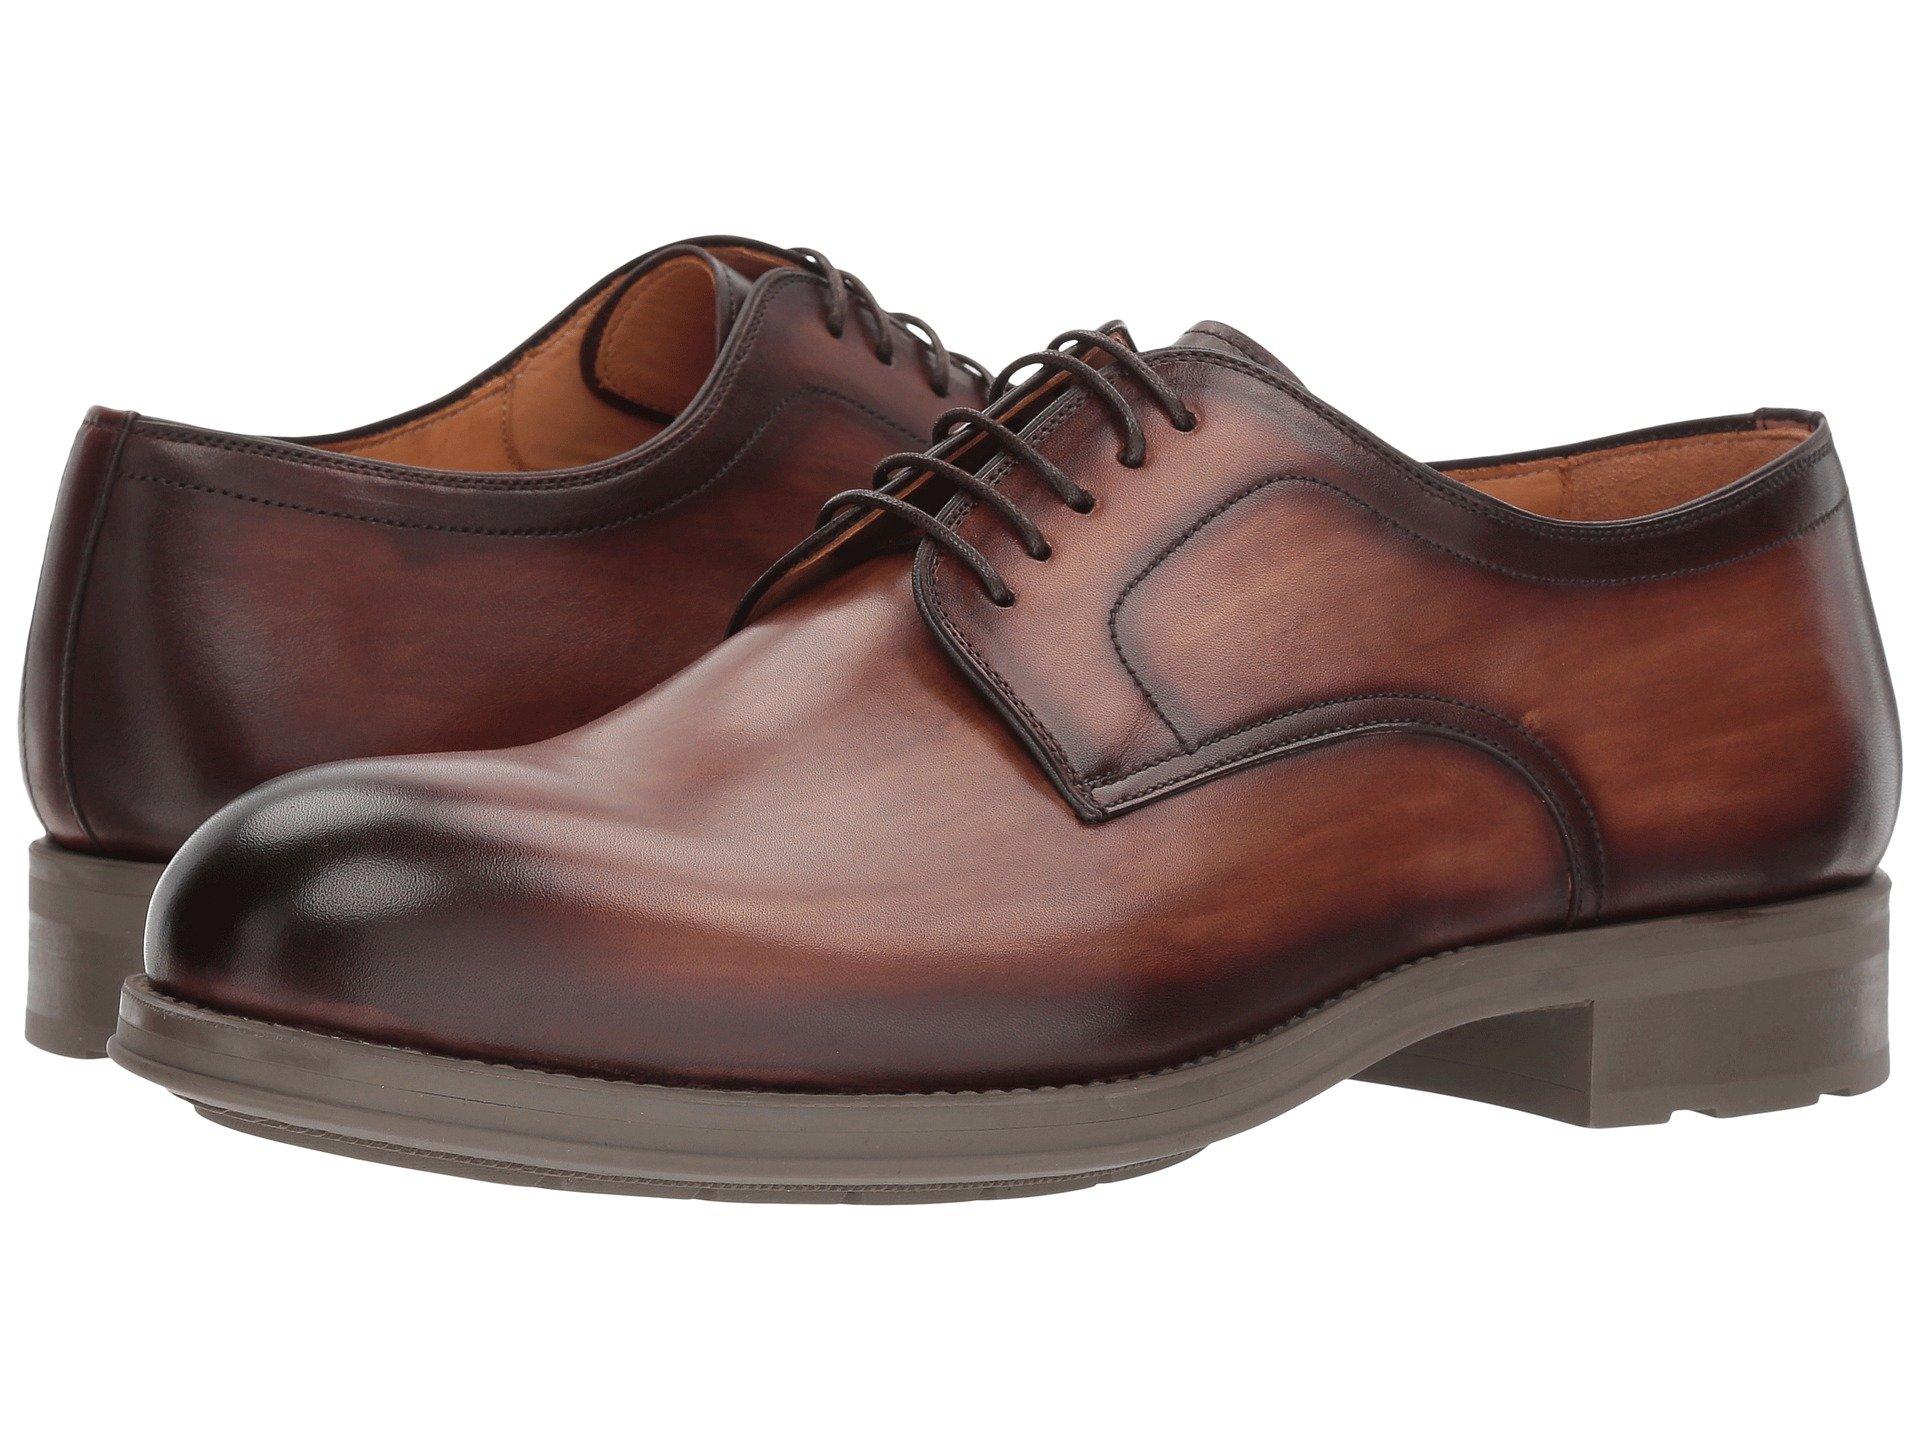 b90530f7cba8 Men s Magnanni Shoes + FREE SHIPPING